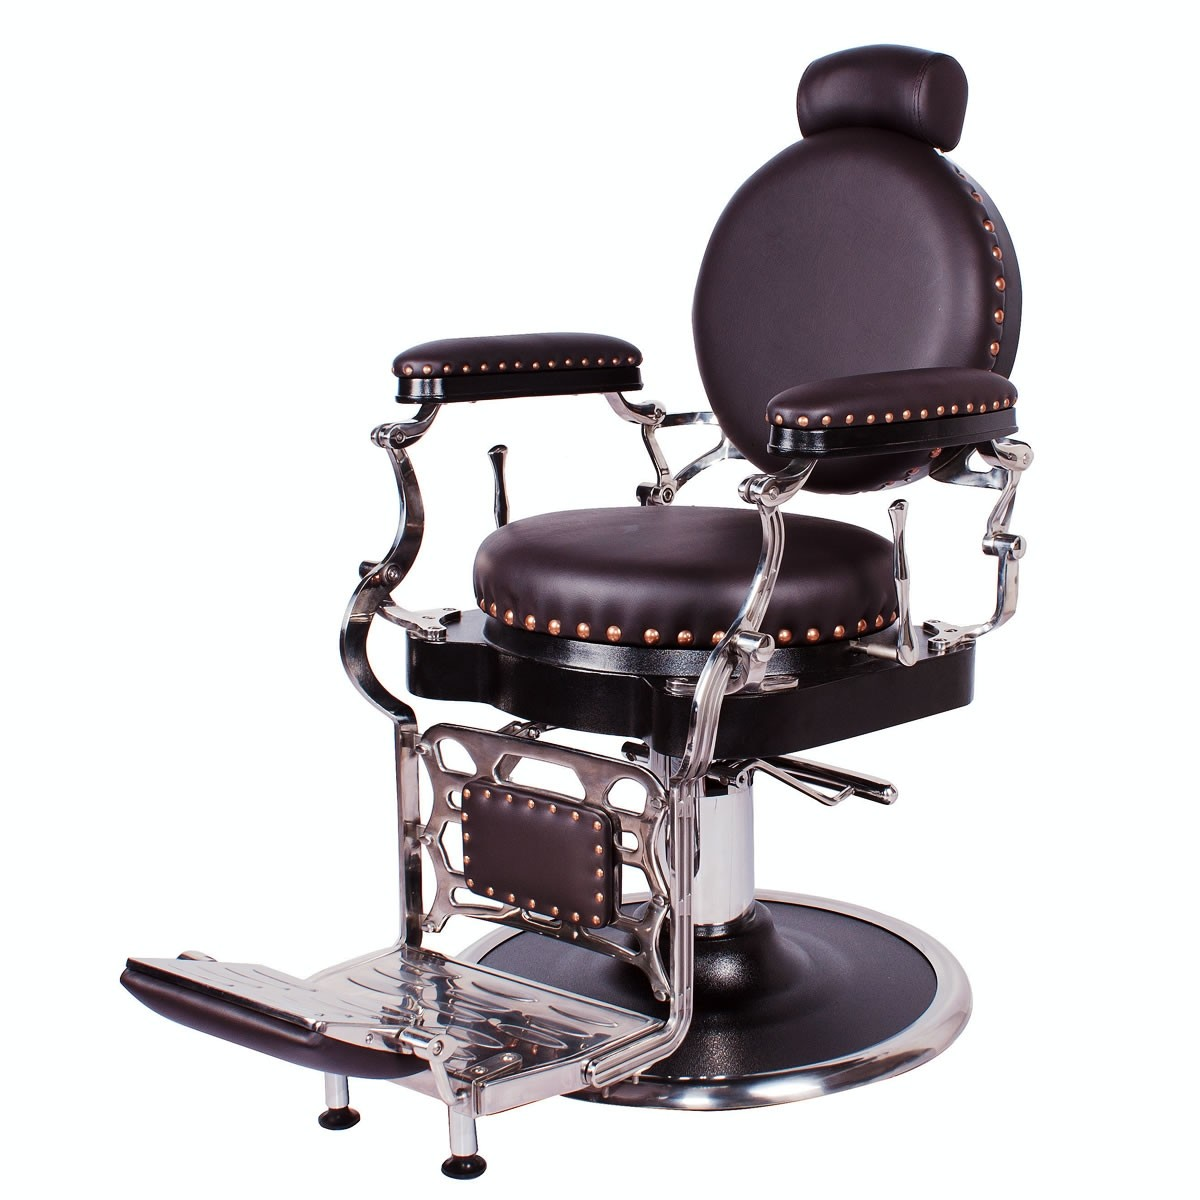 """ZENO"" Antique Barbering Chair, Vintage Barbering Furniture for Sale"